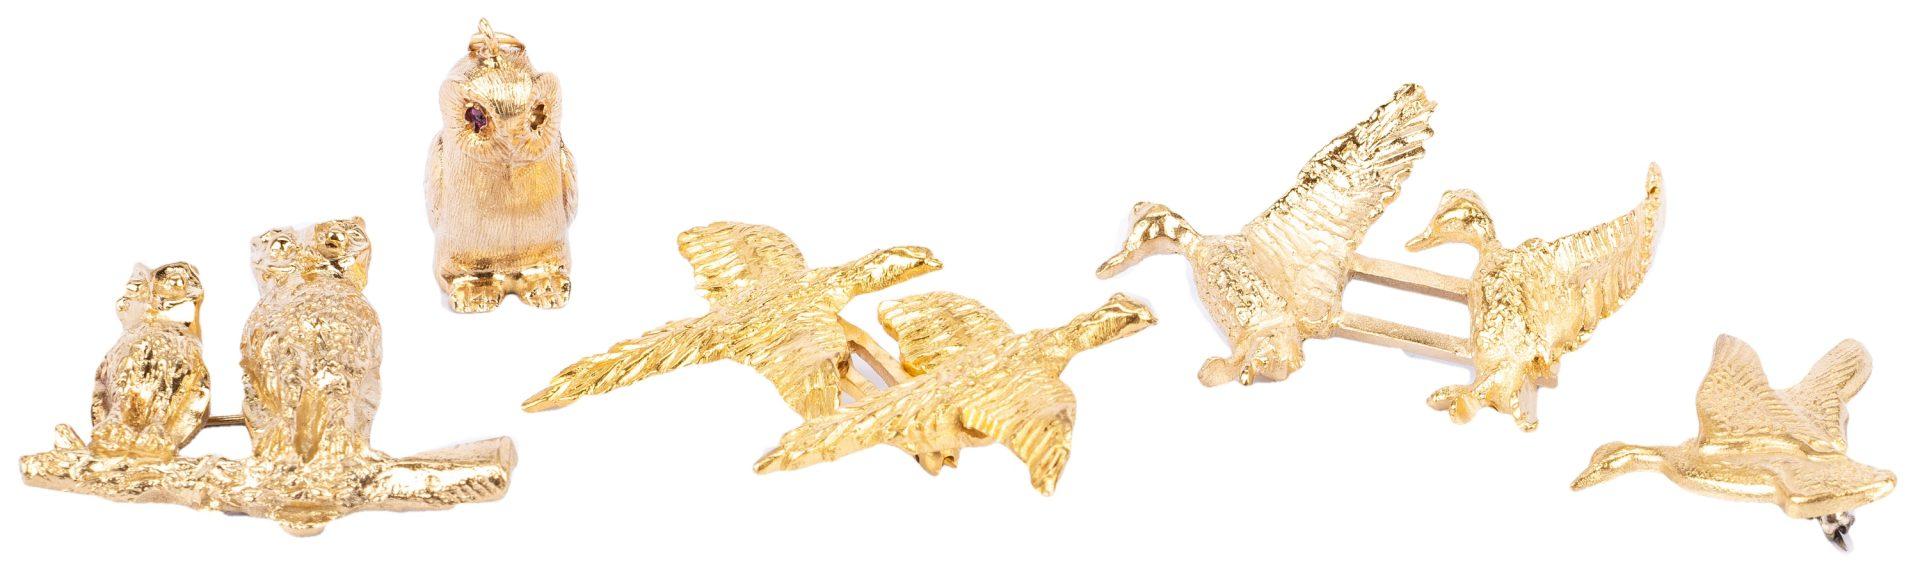 Lot 184: 14K Wild Fowl Jewelry, Pins and Charm